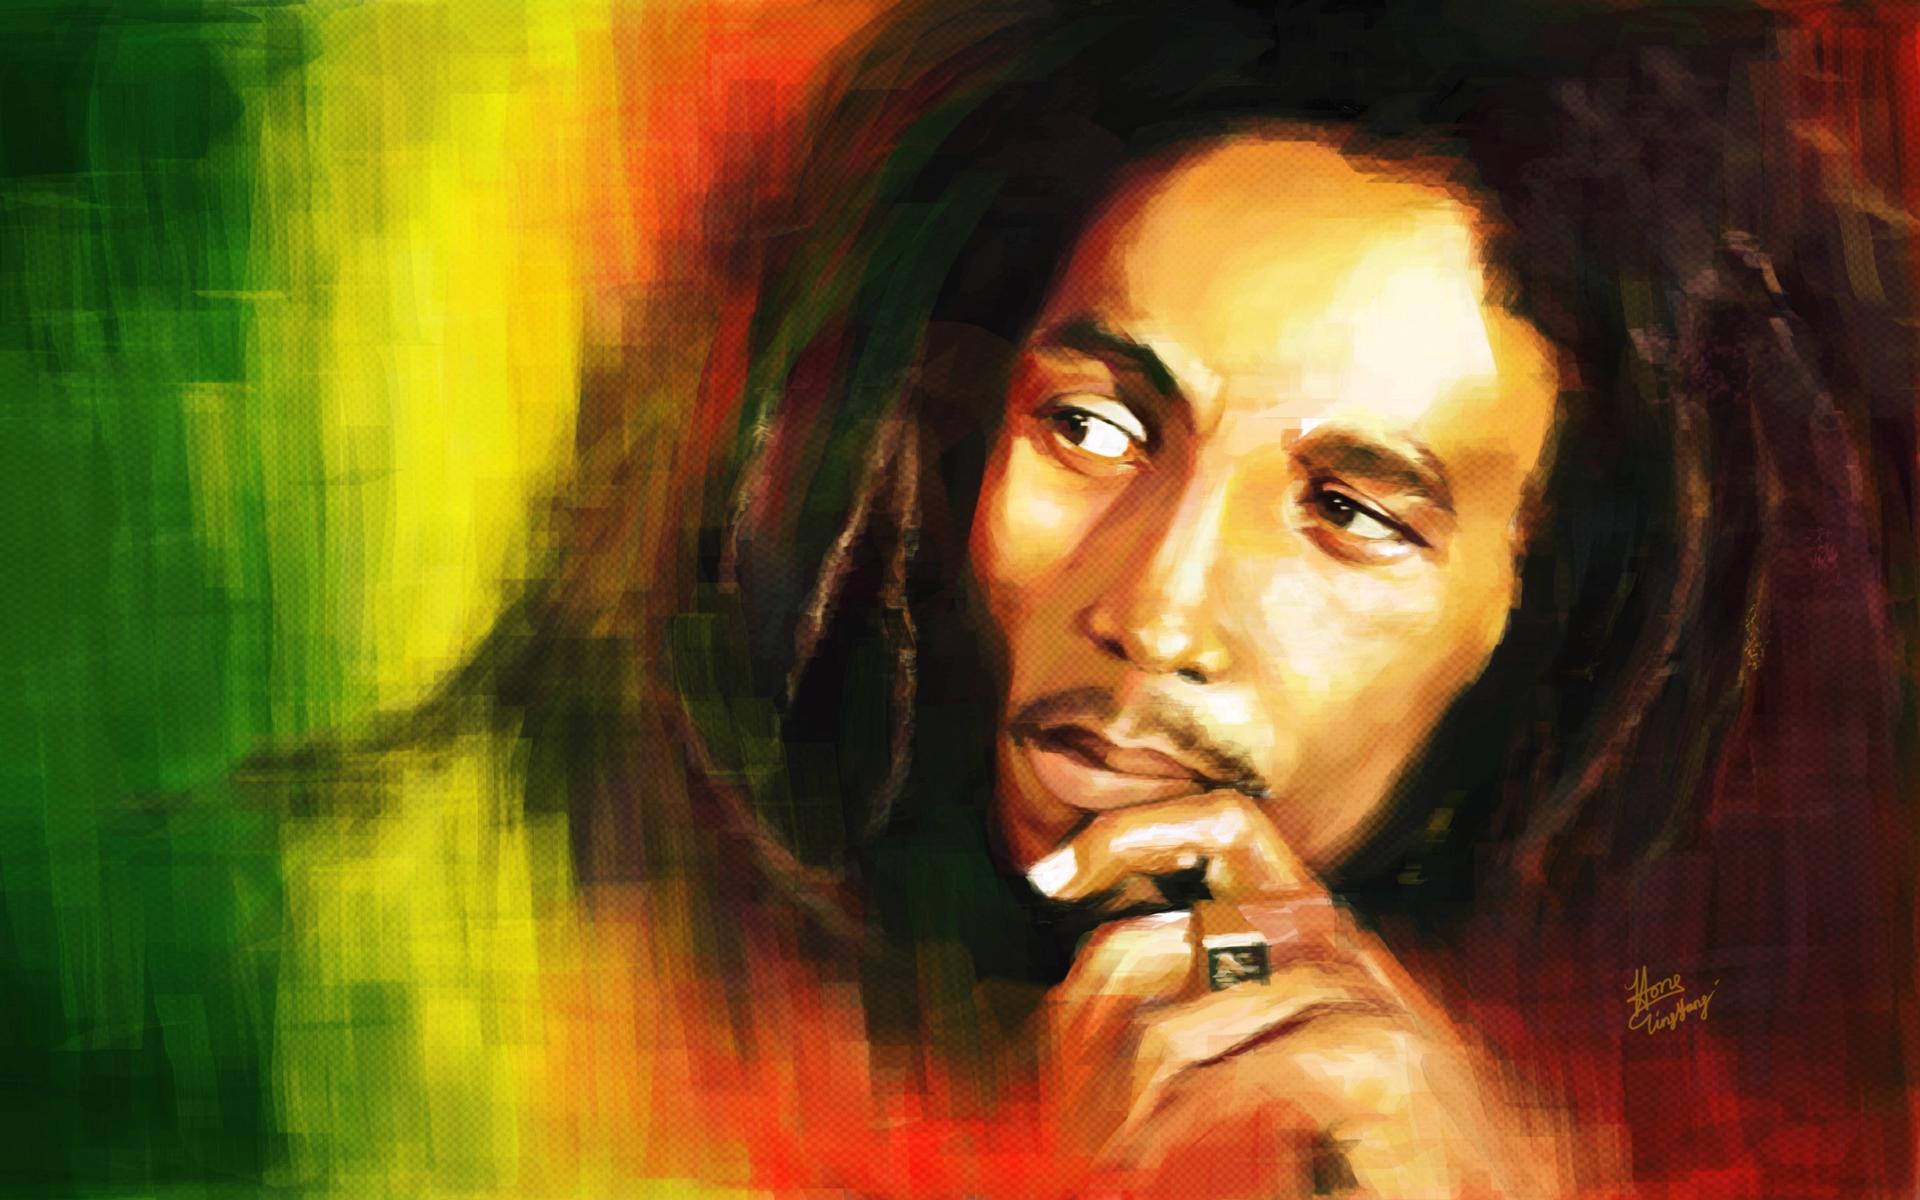 Bob Marley Hd Wallpaper Background Image 1920x1200 Id361209